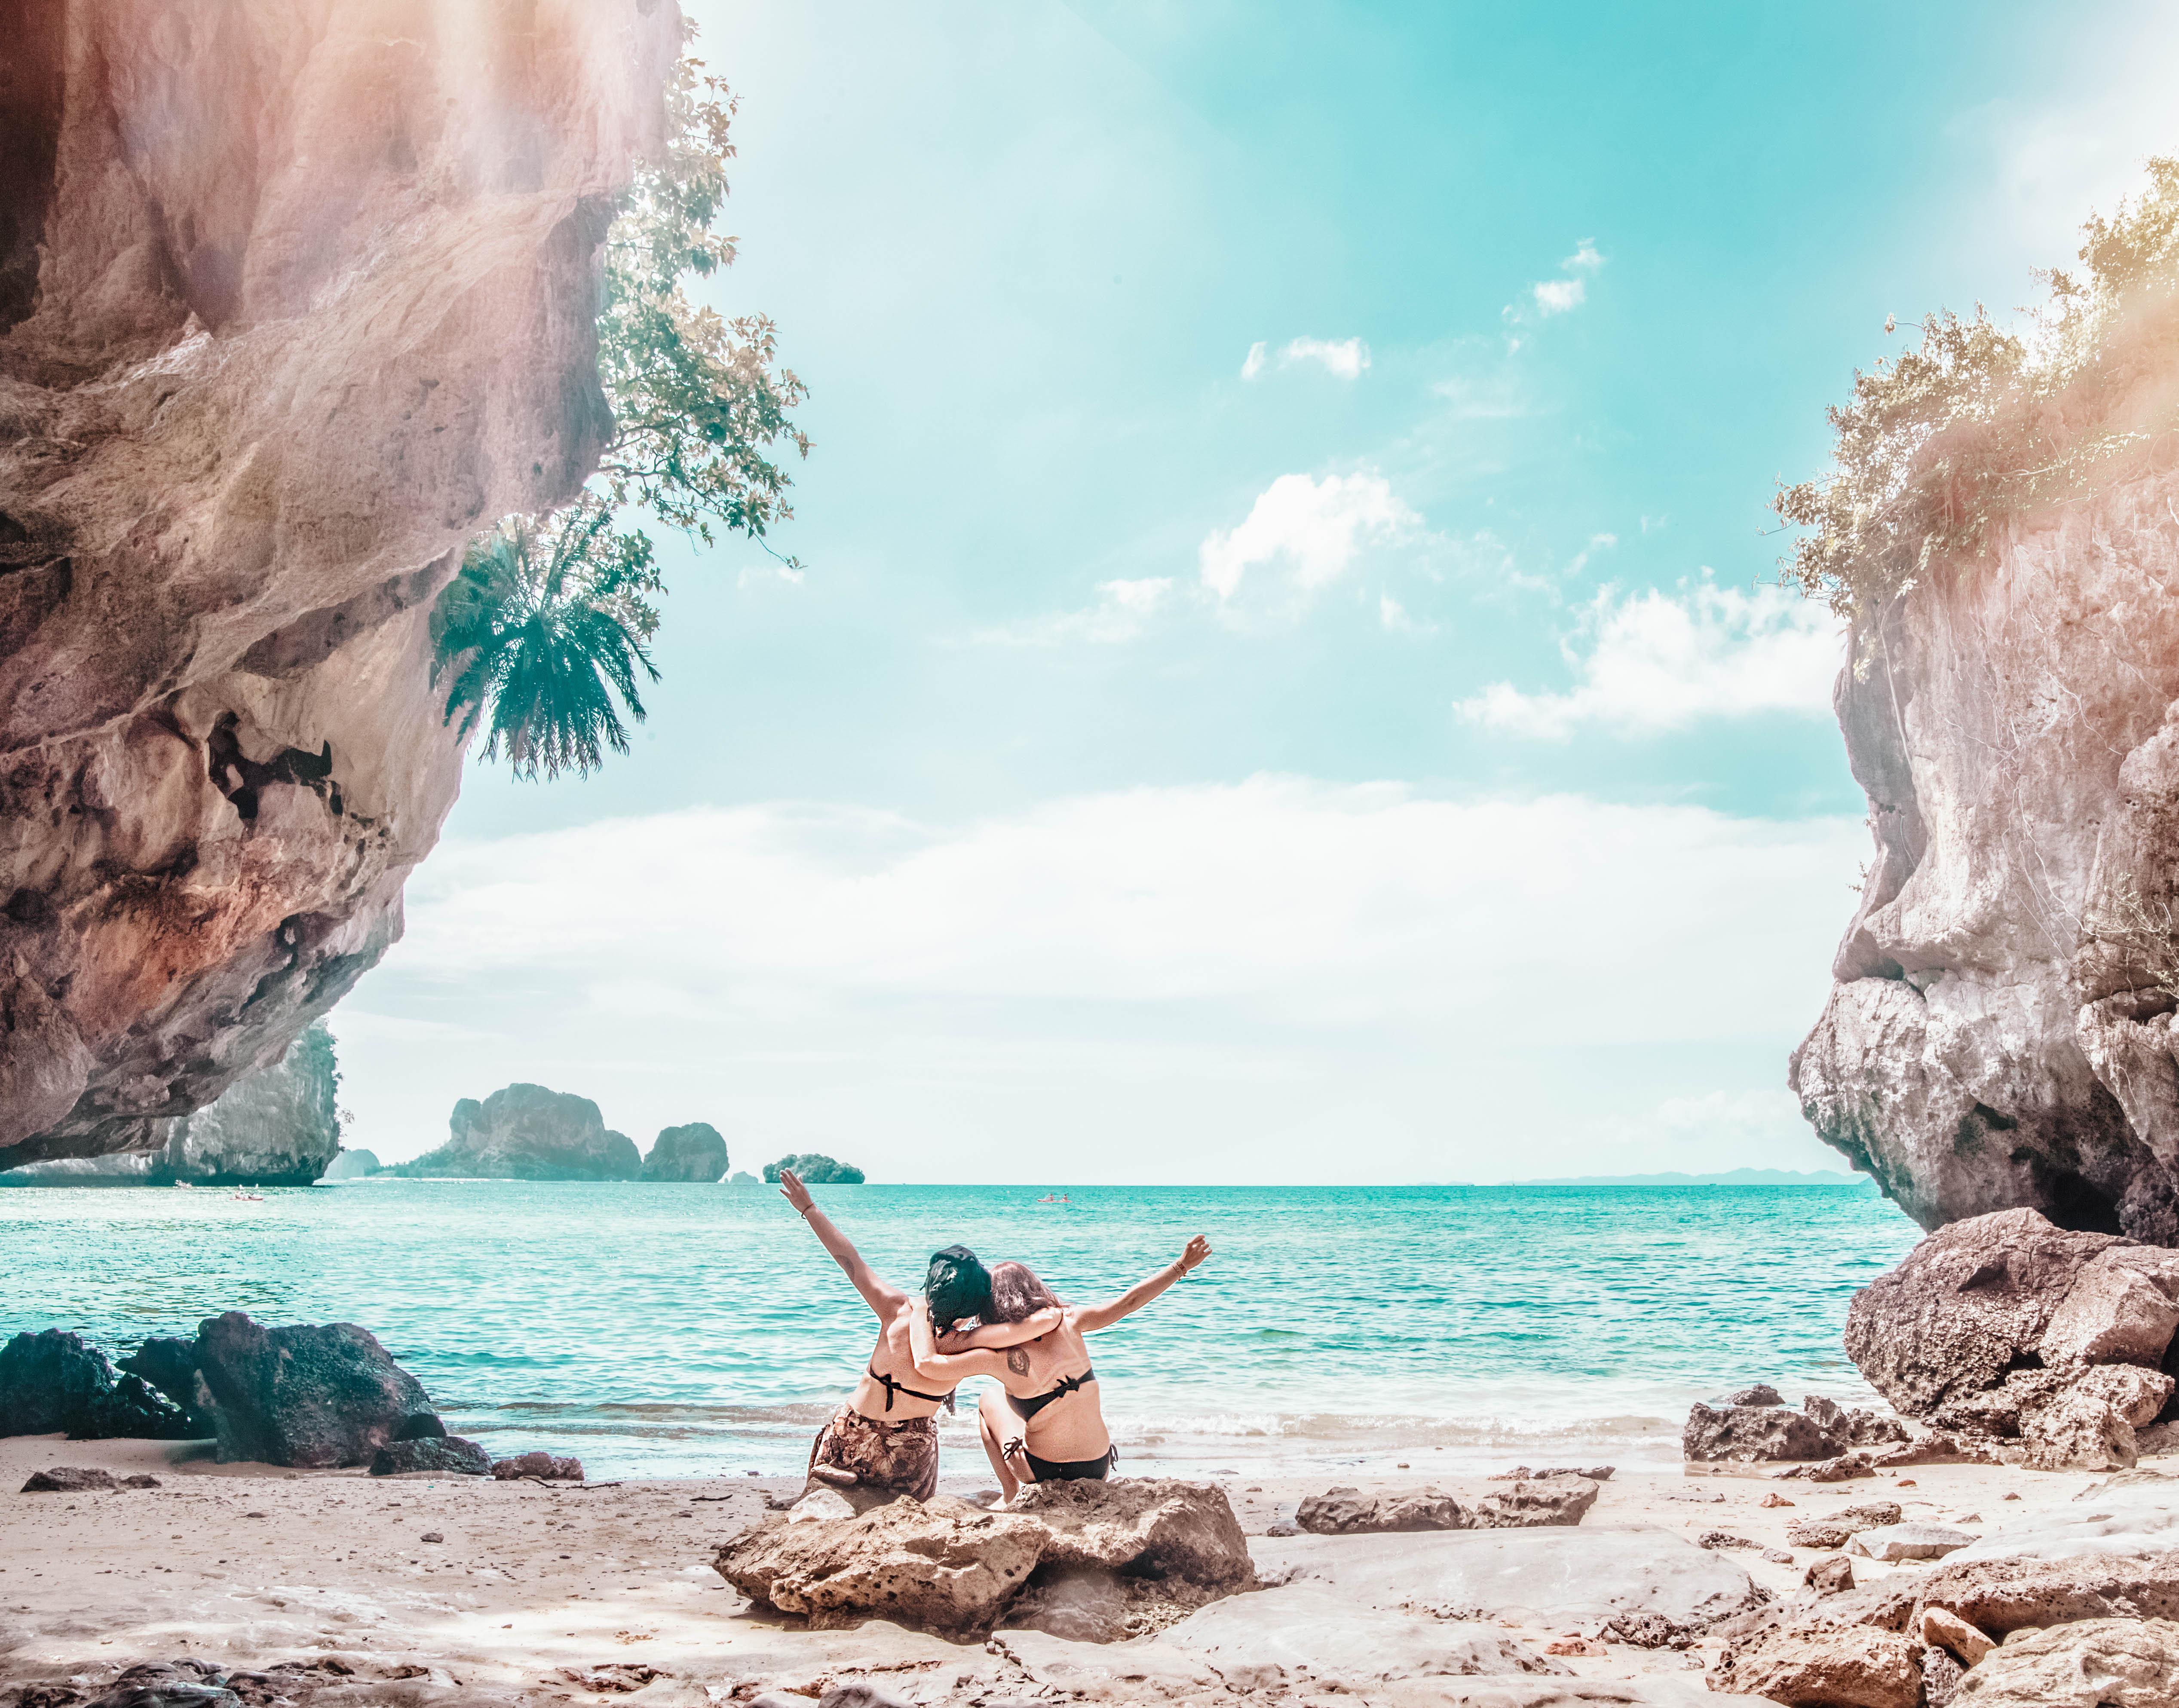 thailand beach krabi railay sunbathing beach day sun burn blue water ocean